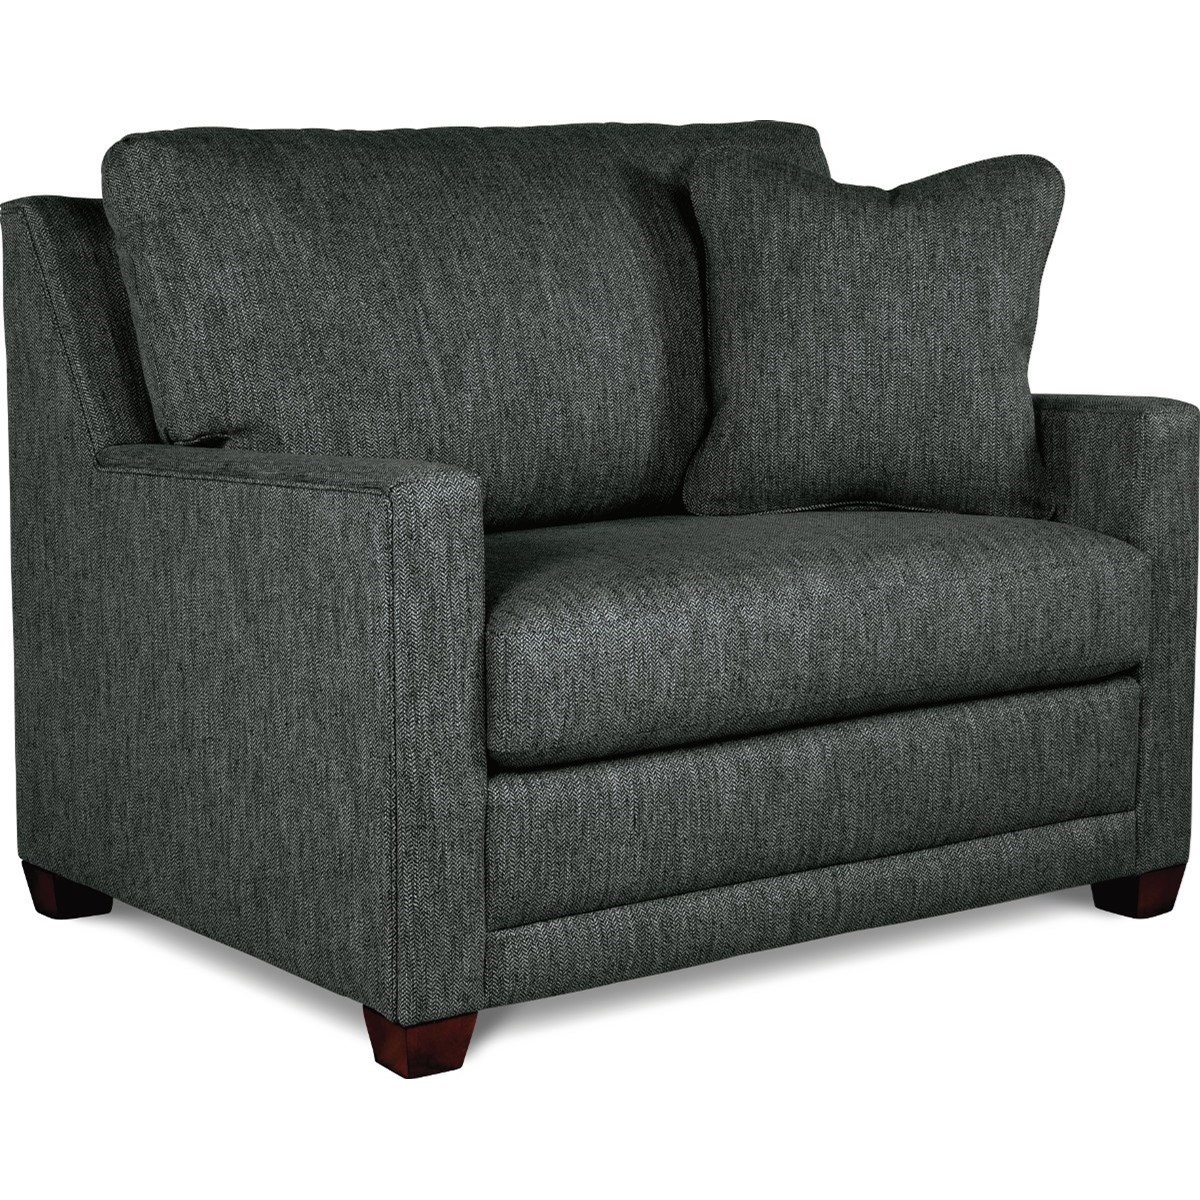 Modern Twin Sleeper Sofa: La-Z-Boy Twilight Contemporary Twin Sofa Sleeper